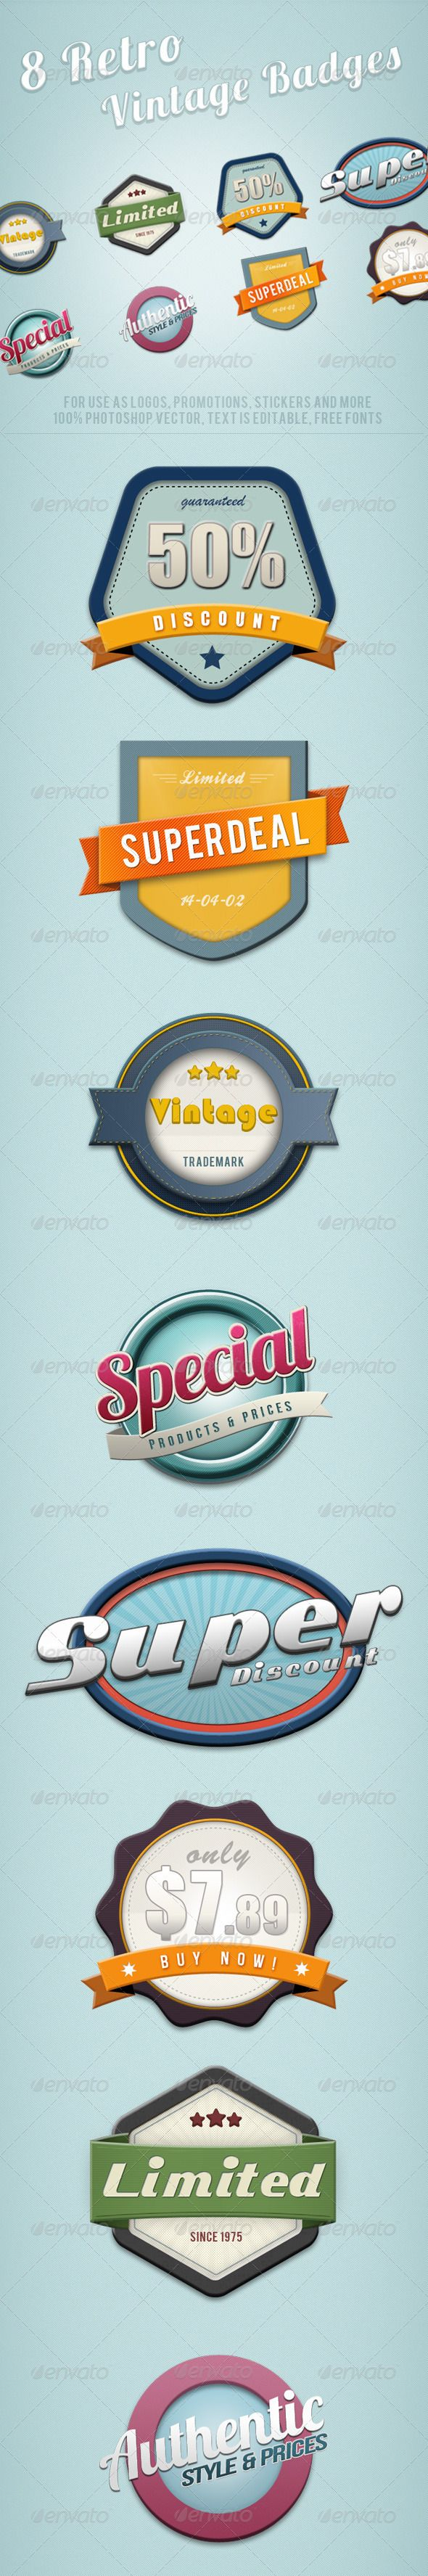 8 Retro Vintage Badges #photoshop #psd #grunge labels #badges • Available here → https://graphicriver.net/item/8-retro-vintage-badges-/2204846?ref=pxcr